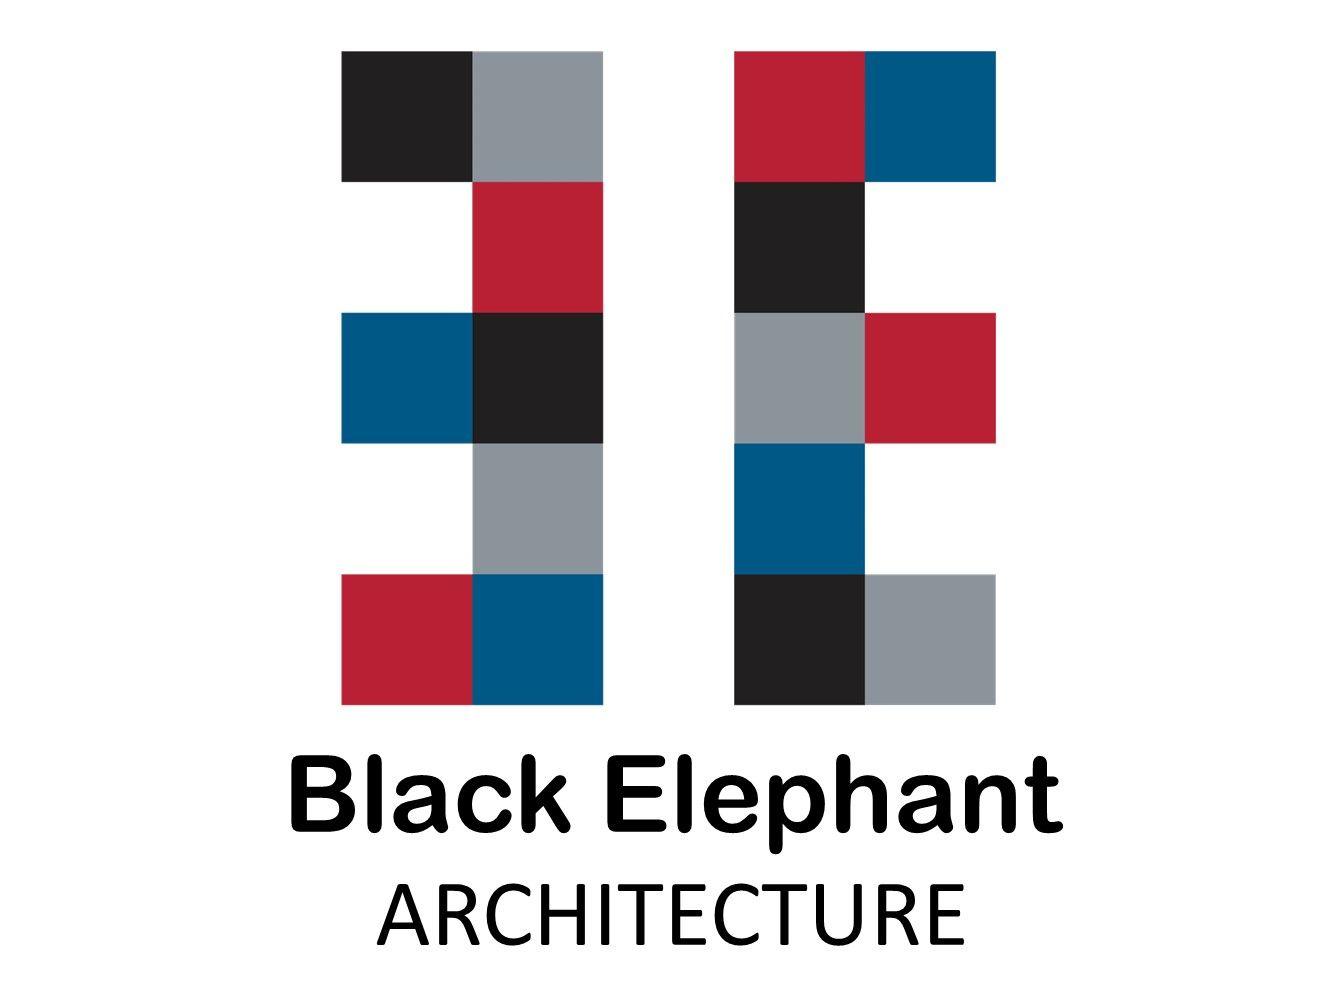 Black Elephant Architecture